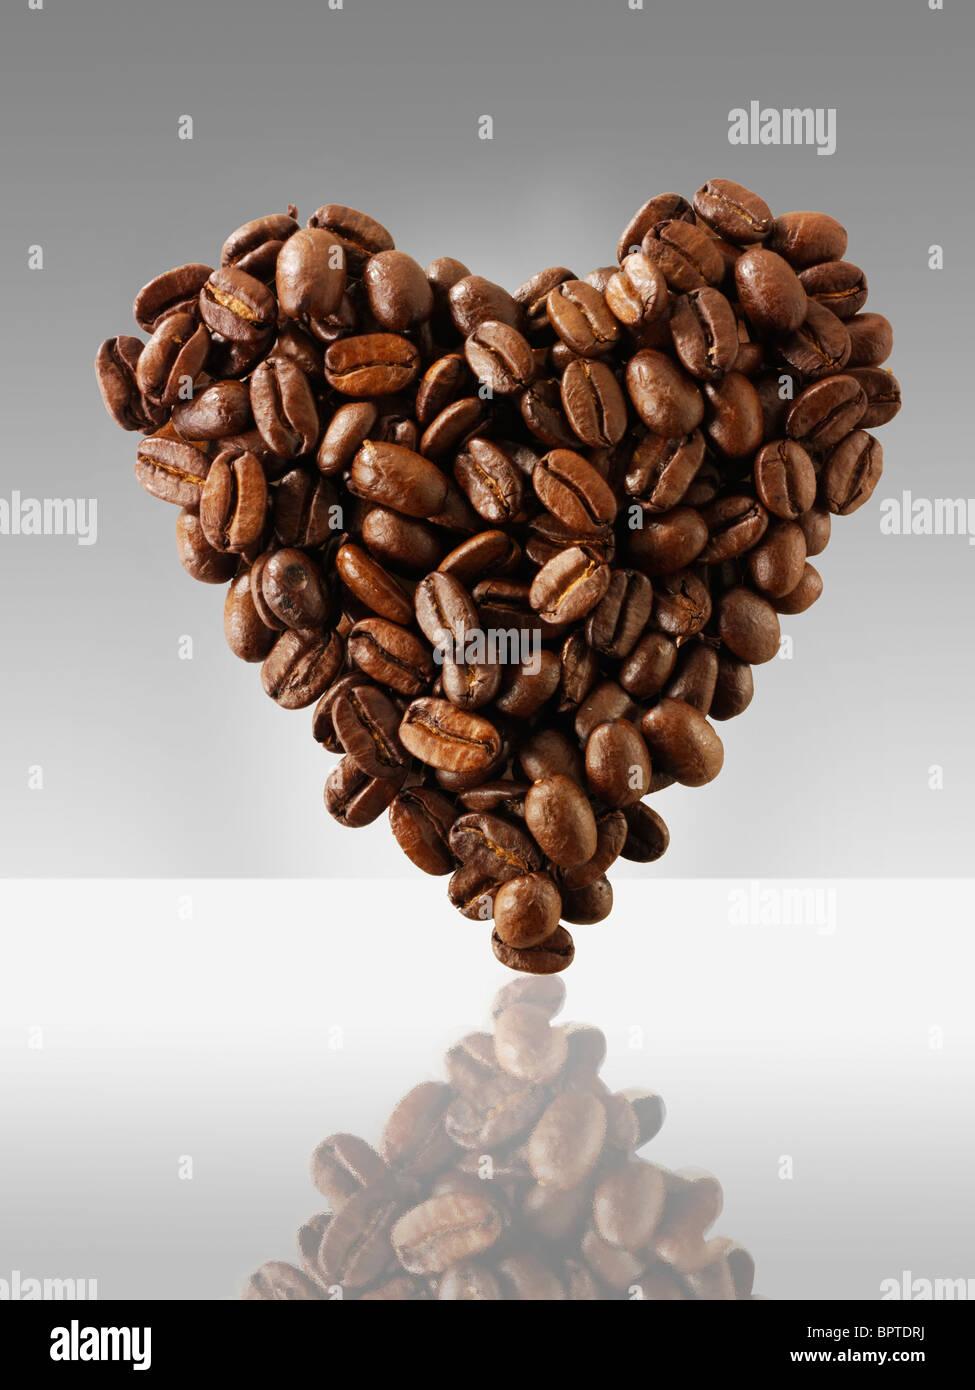 """I chicchi di caffè in una forma di cuore, mi piace il caffè foto, foto & immagine Immagini Stock"